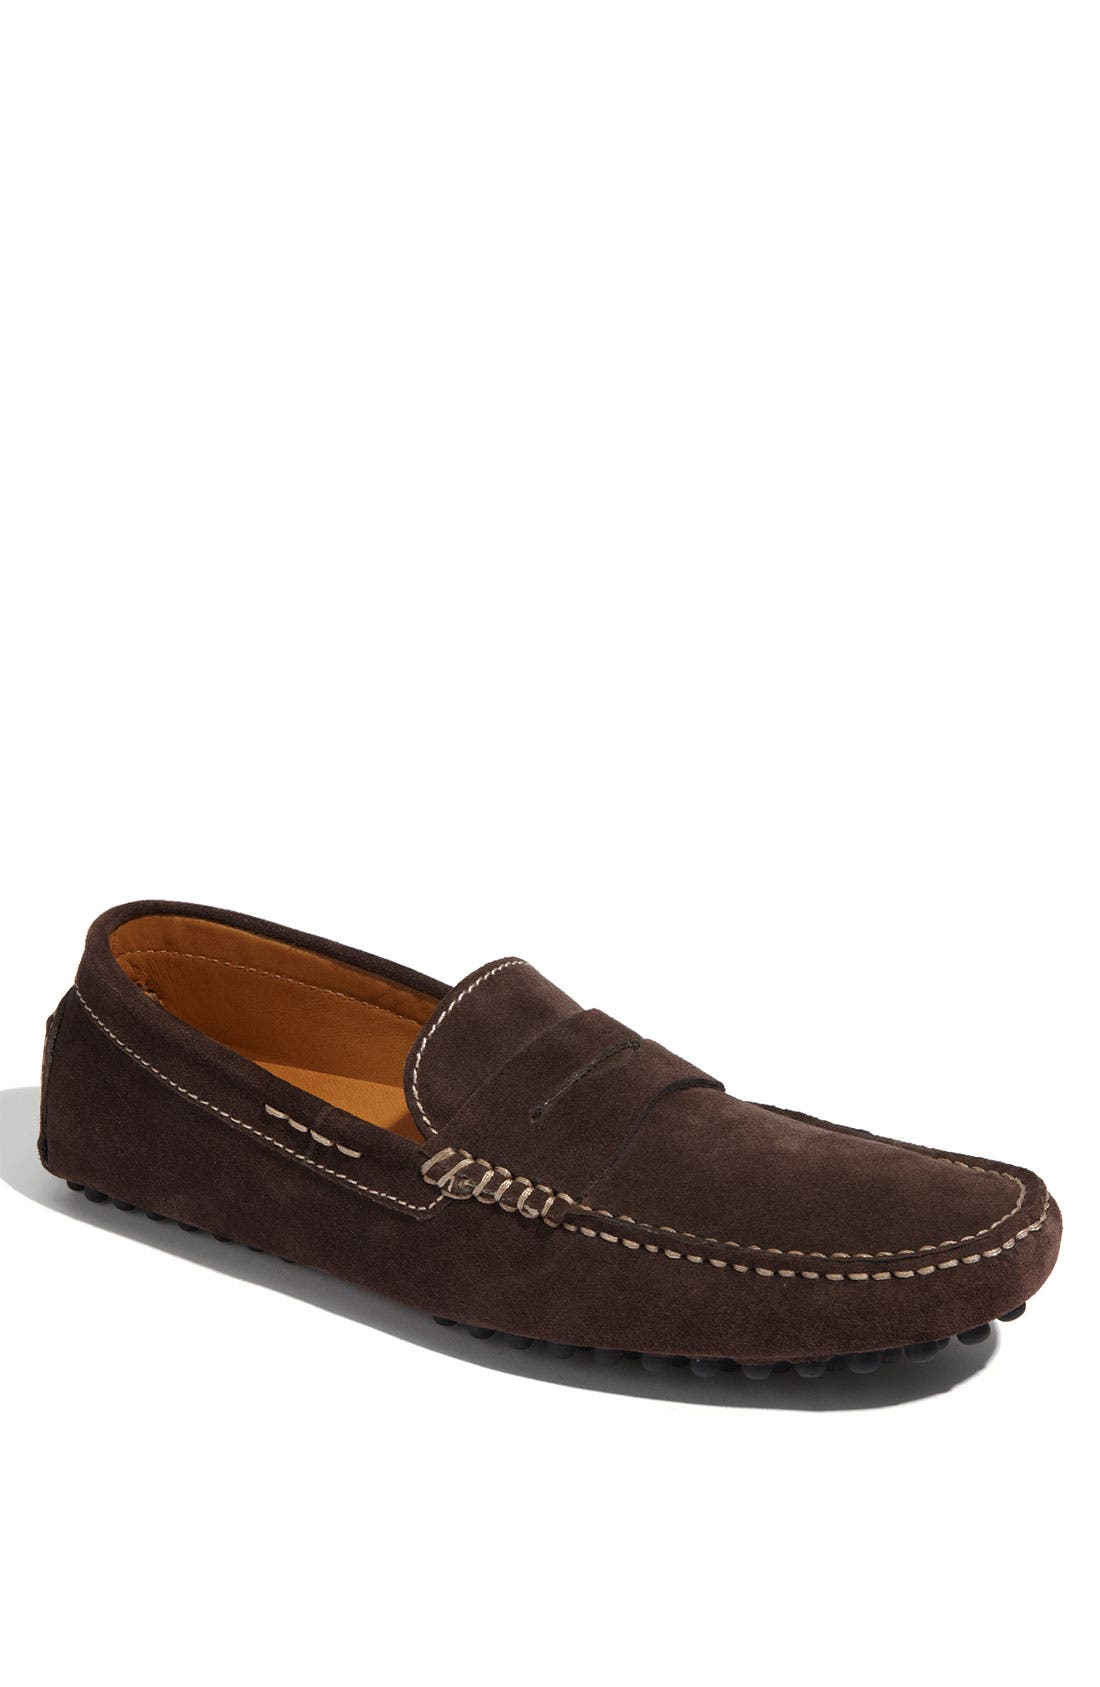 'Tobago' Driving Shoe,                         Main,                         color, Brown